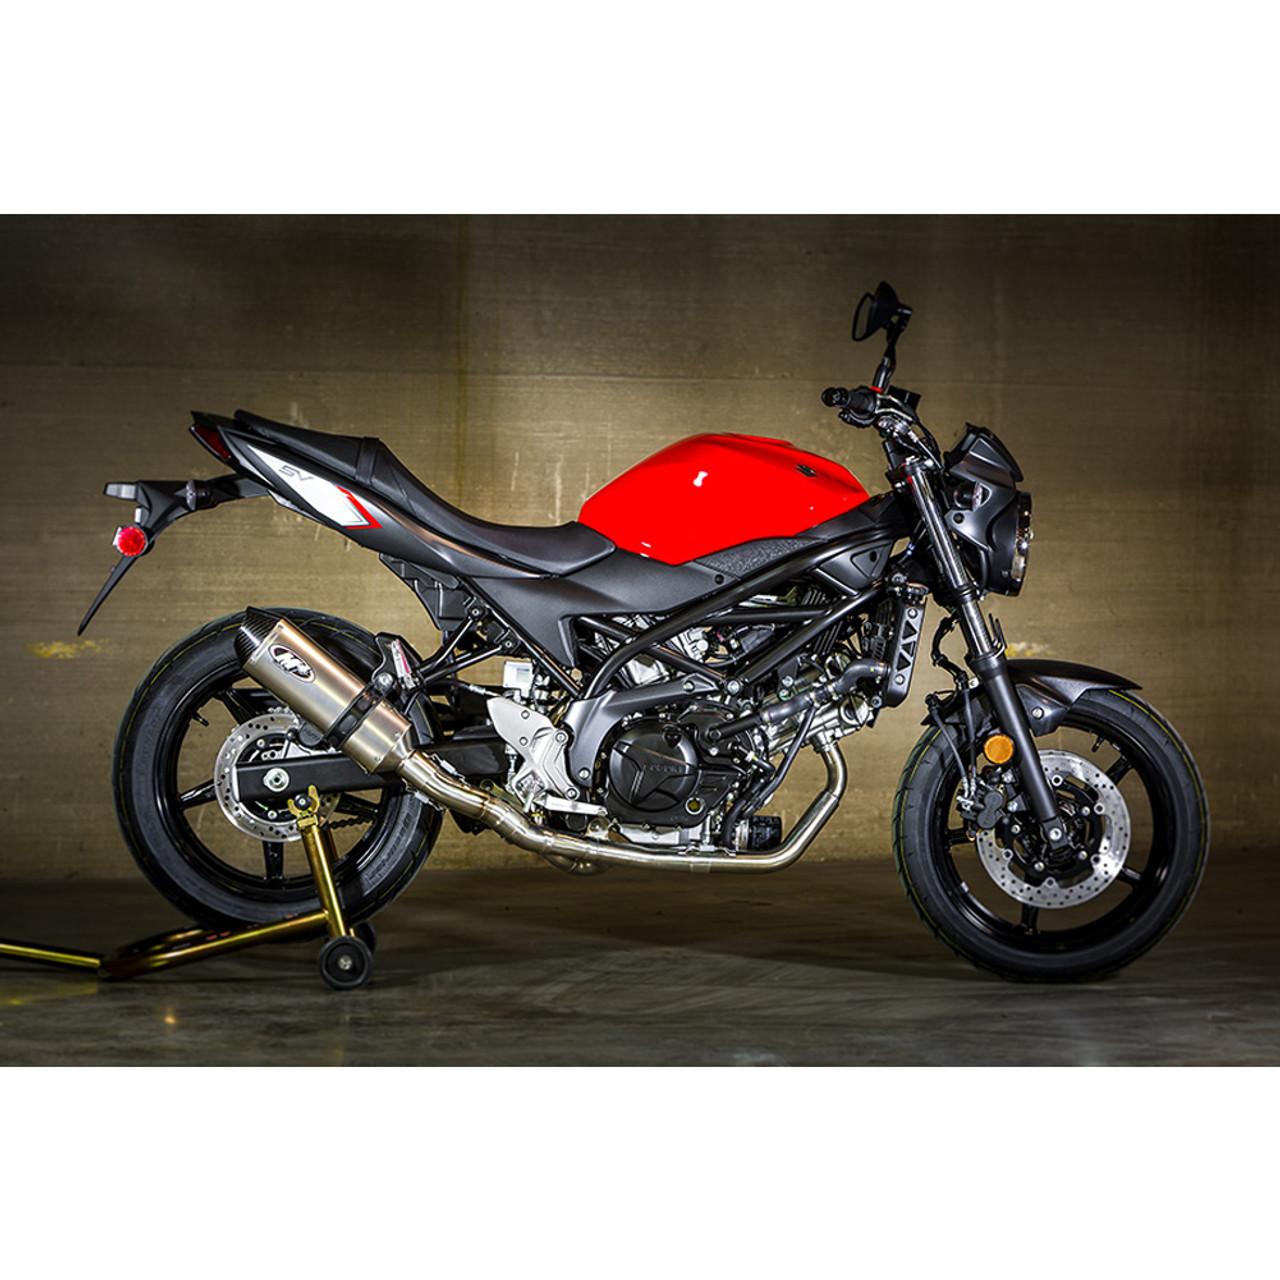 M4 Suzuki Sv650 2017 2020 Race Mount Full Exhaust System